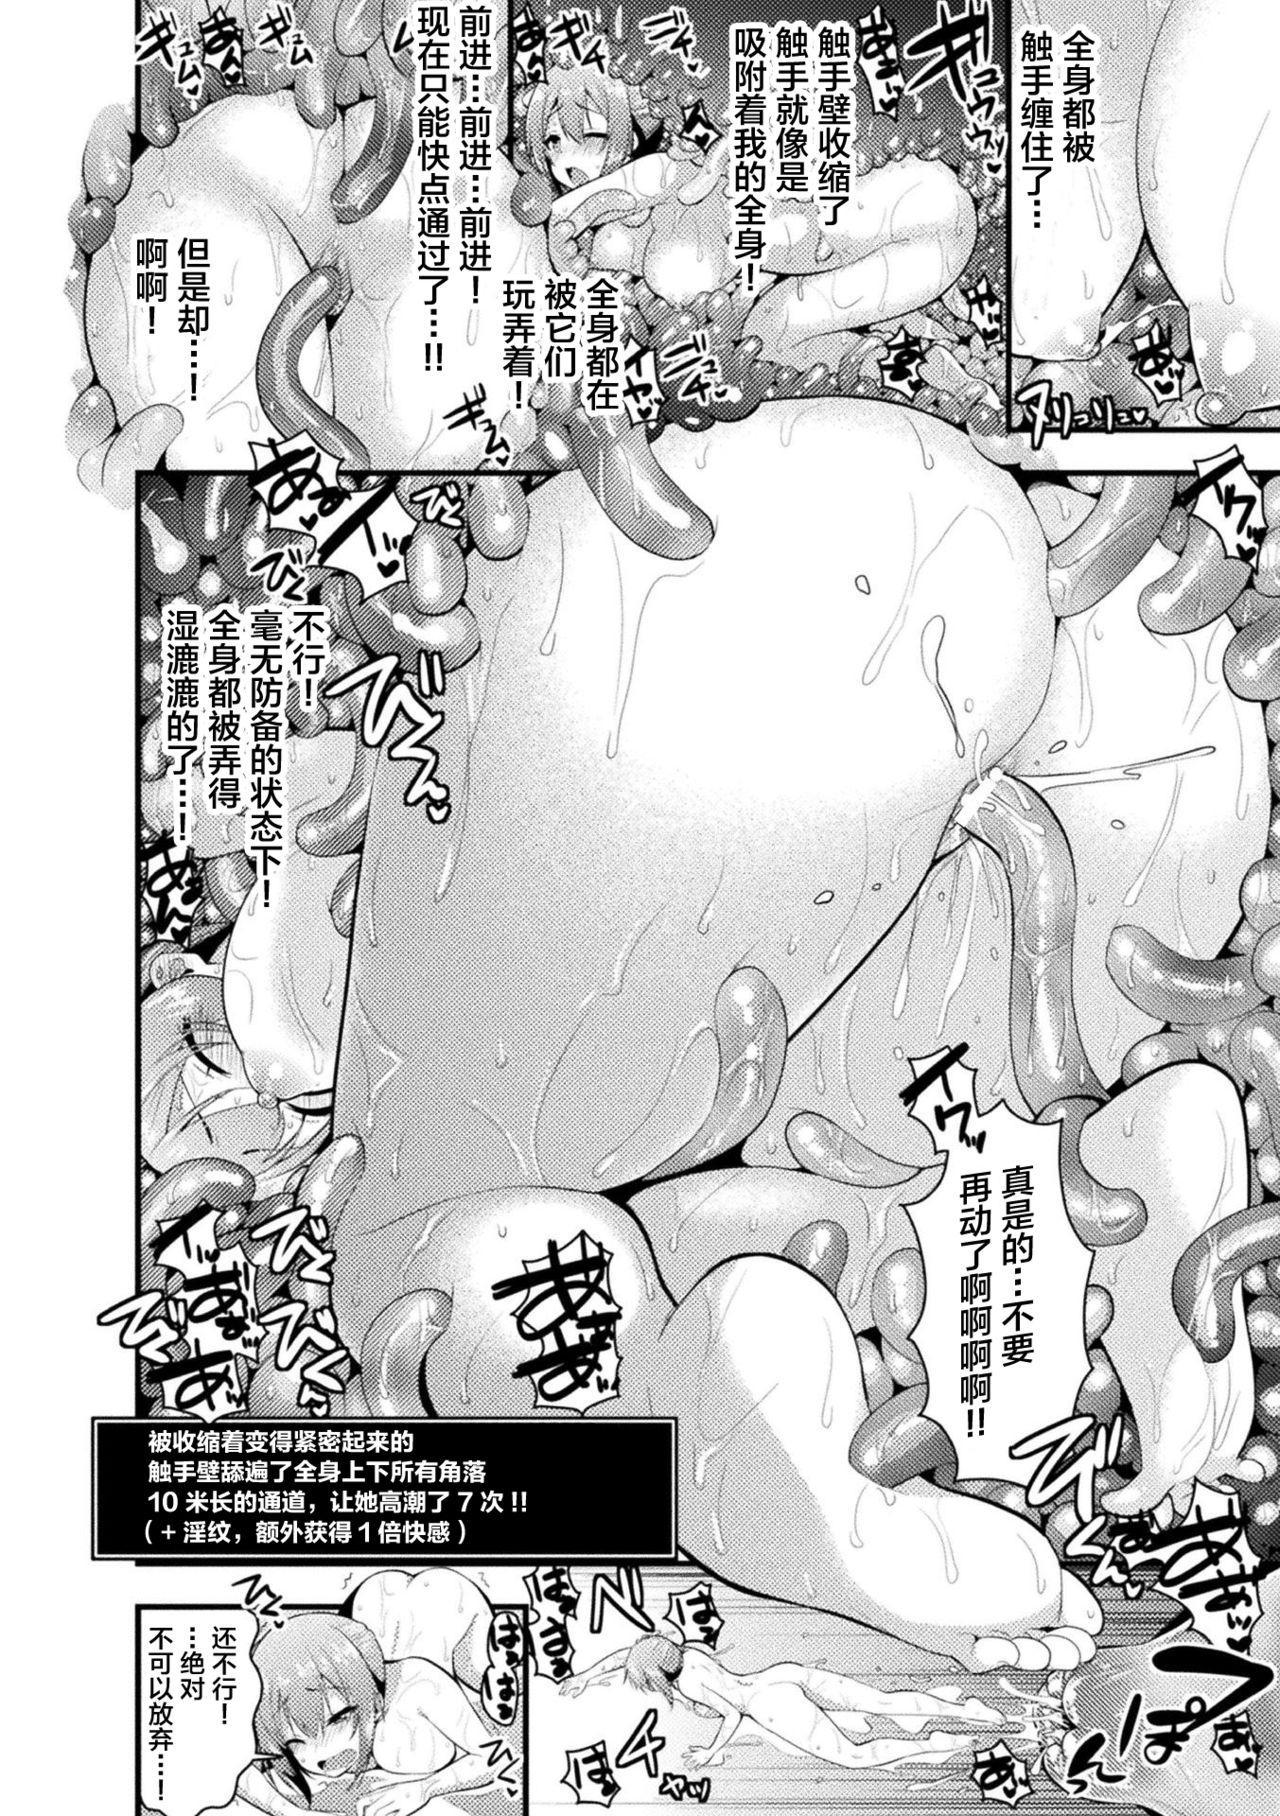 2D Comic Magazine Zecchou Kairaku ga Tomaranai Ero-Trap Dungeon Vol. 1 51